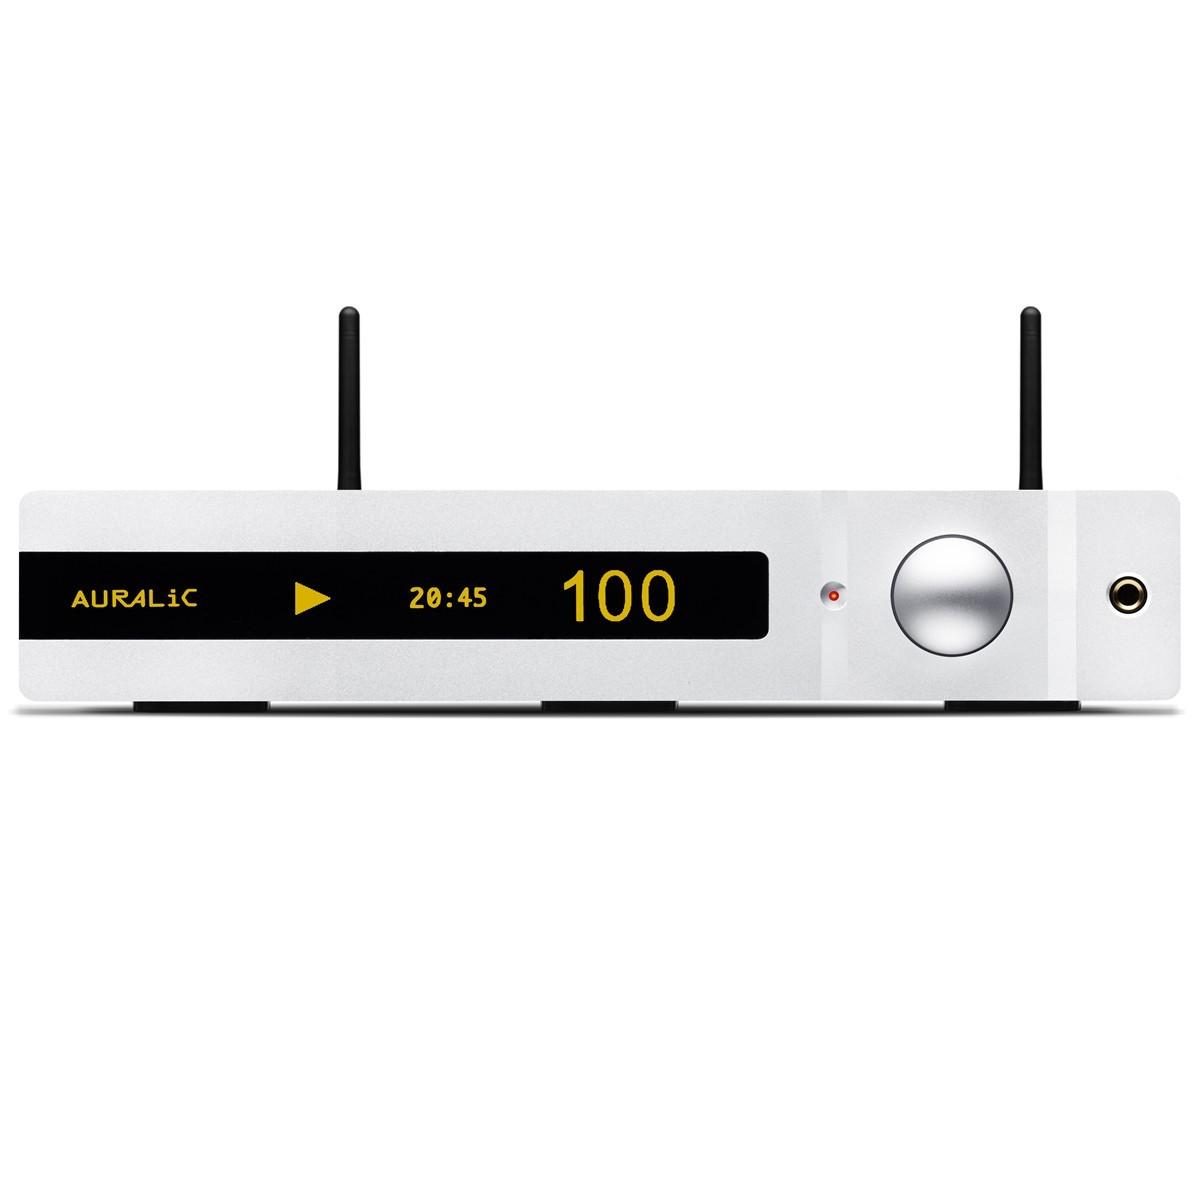 AURALiC Altair Hi-Fi Streamer DAC 32bit 384Khz AES/EBU Femtoclock Silver